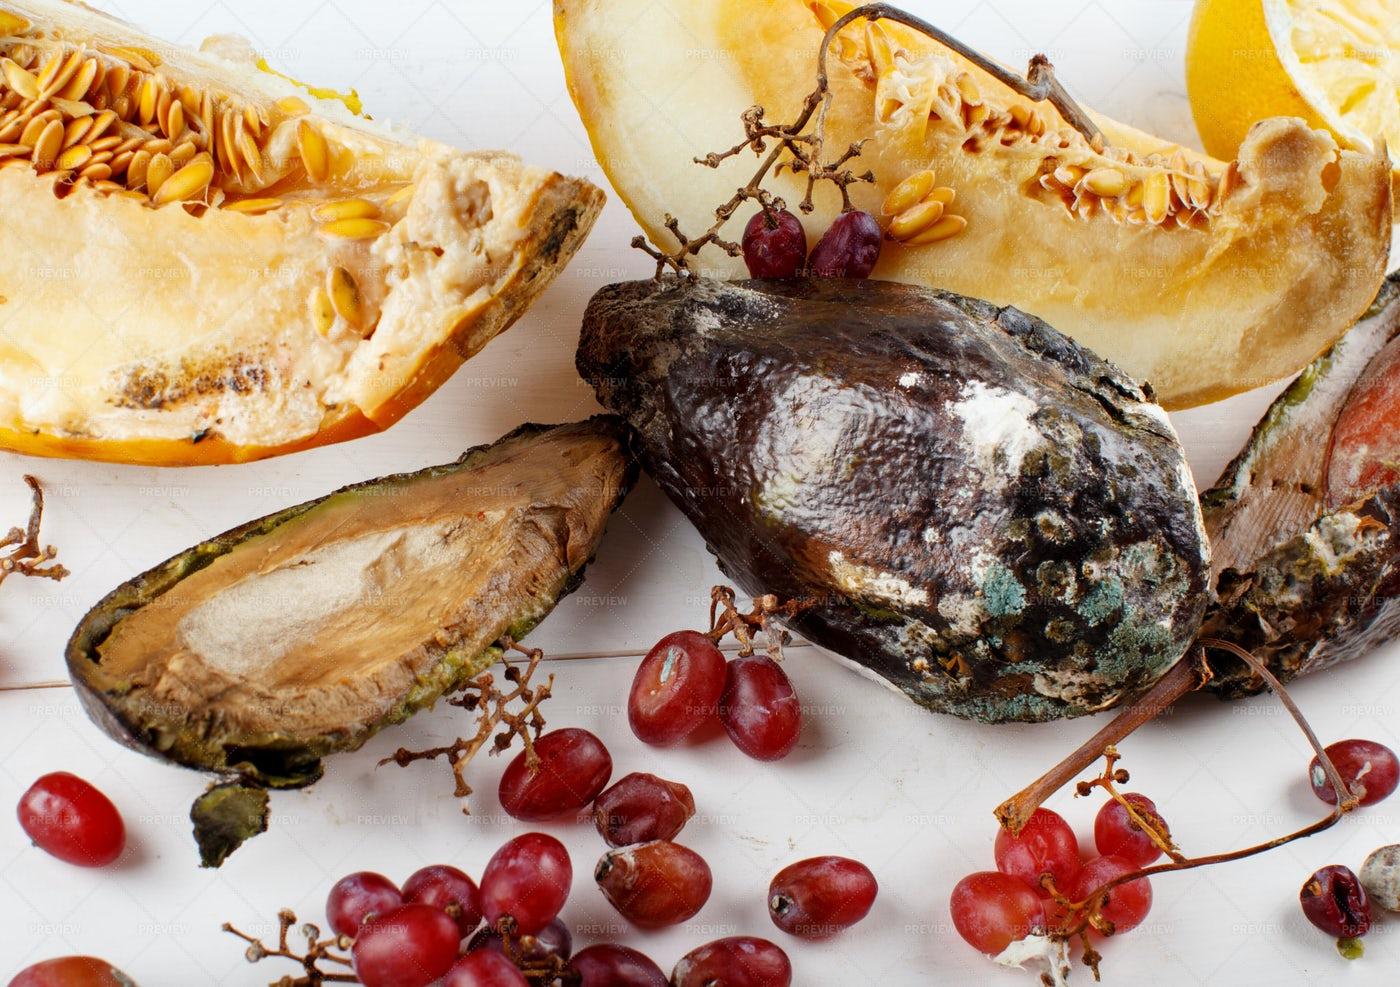 Rotting Fruit: Stock Photos